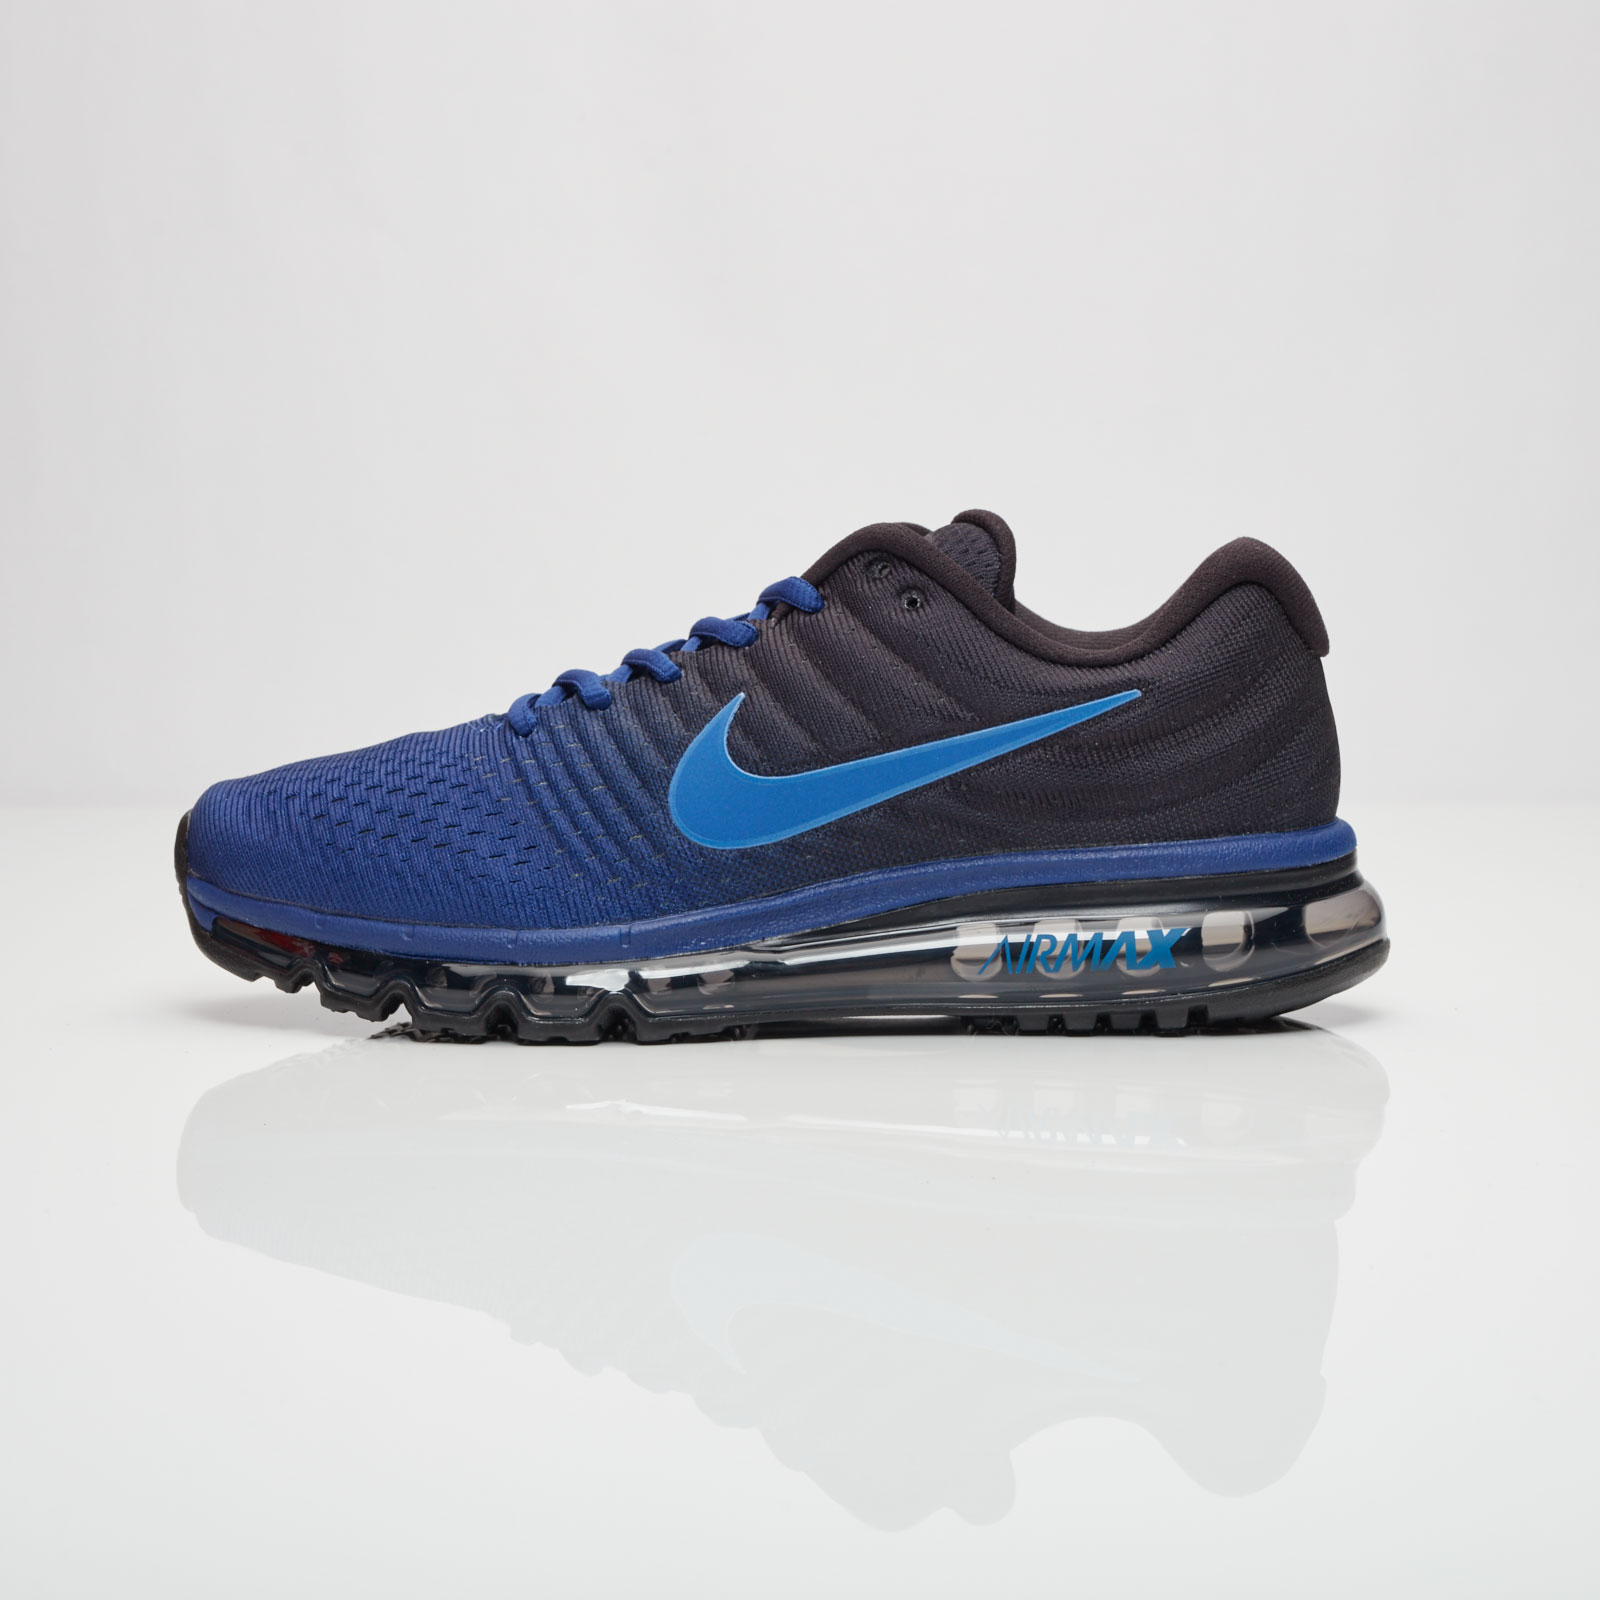 8335d2a583 Nike Air Max 2017 - 849559-401 - Sneakersnstuff | sneakers & streetwear  online since 1999